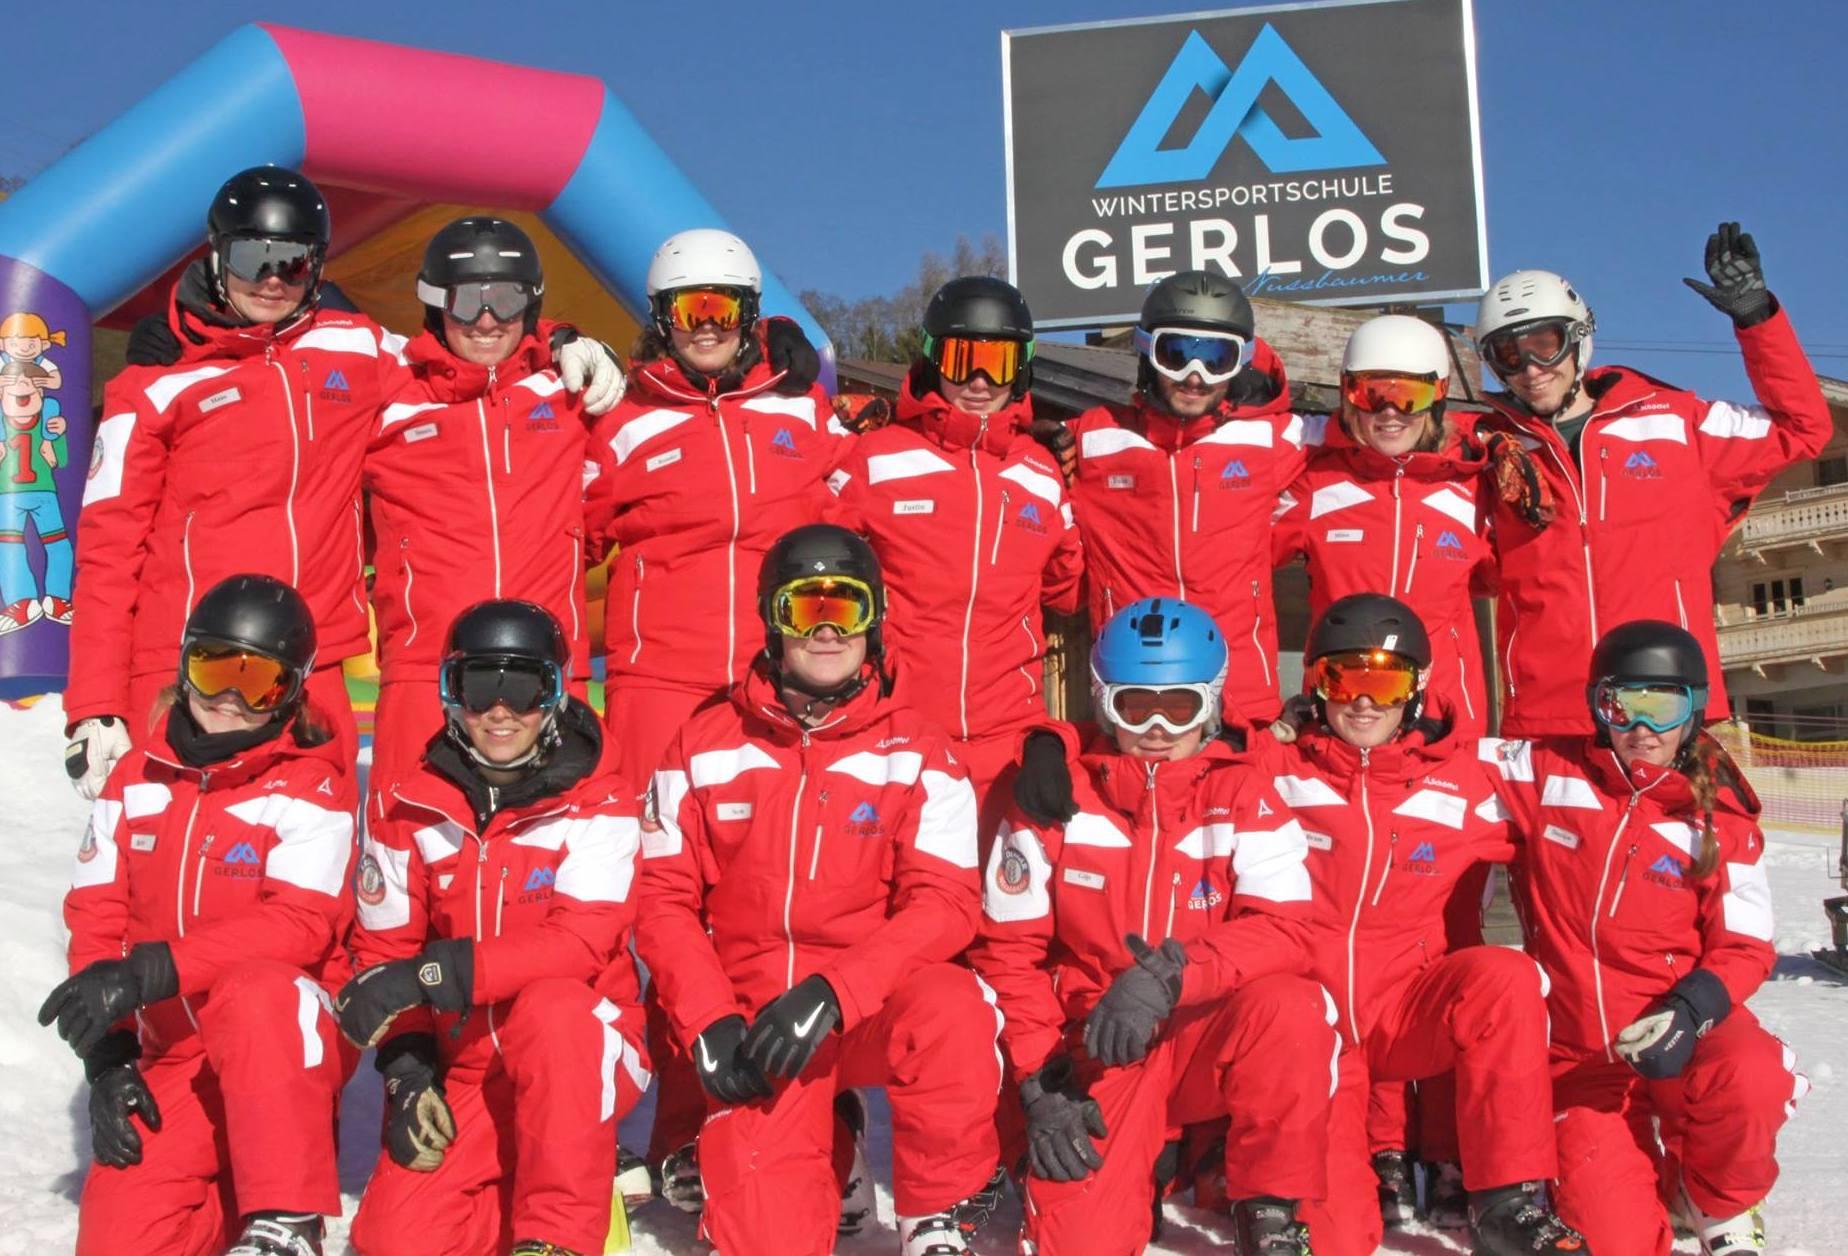 Wintersportschule Gerlos, Skipodium,